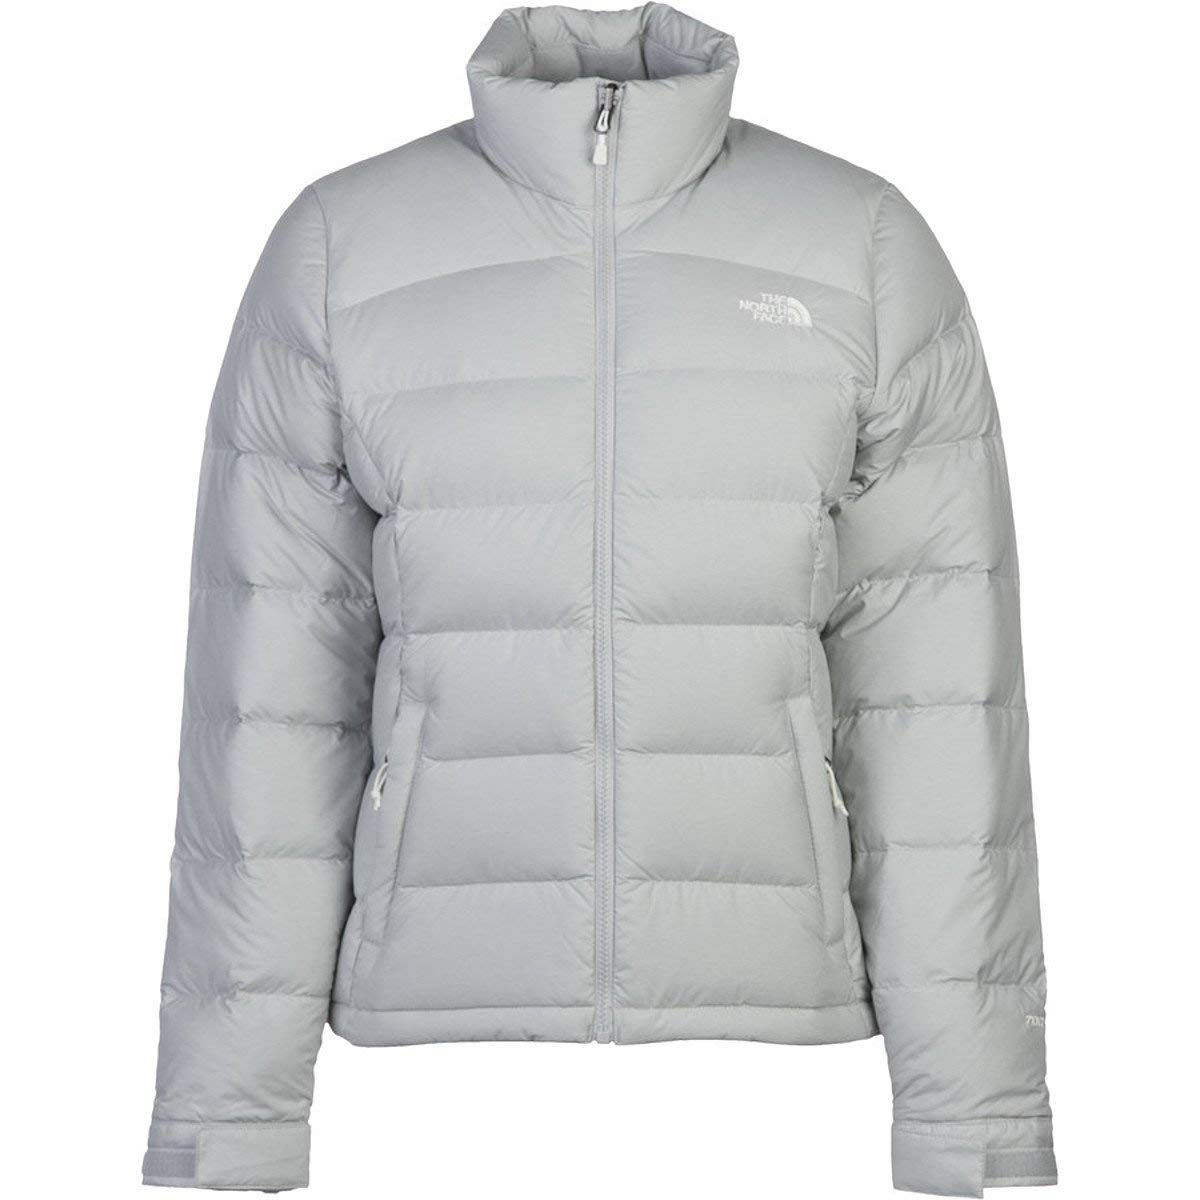 The north face nuptse 2 jacket women's